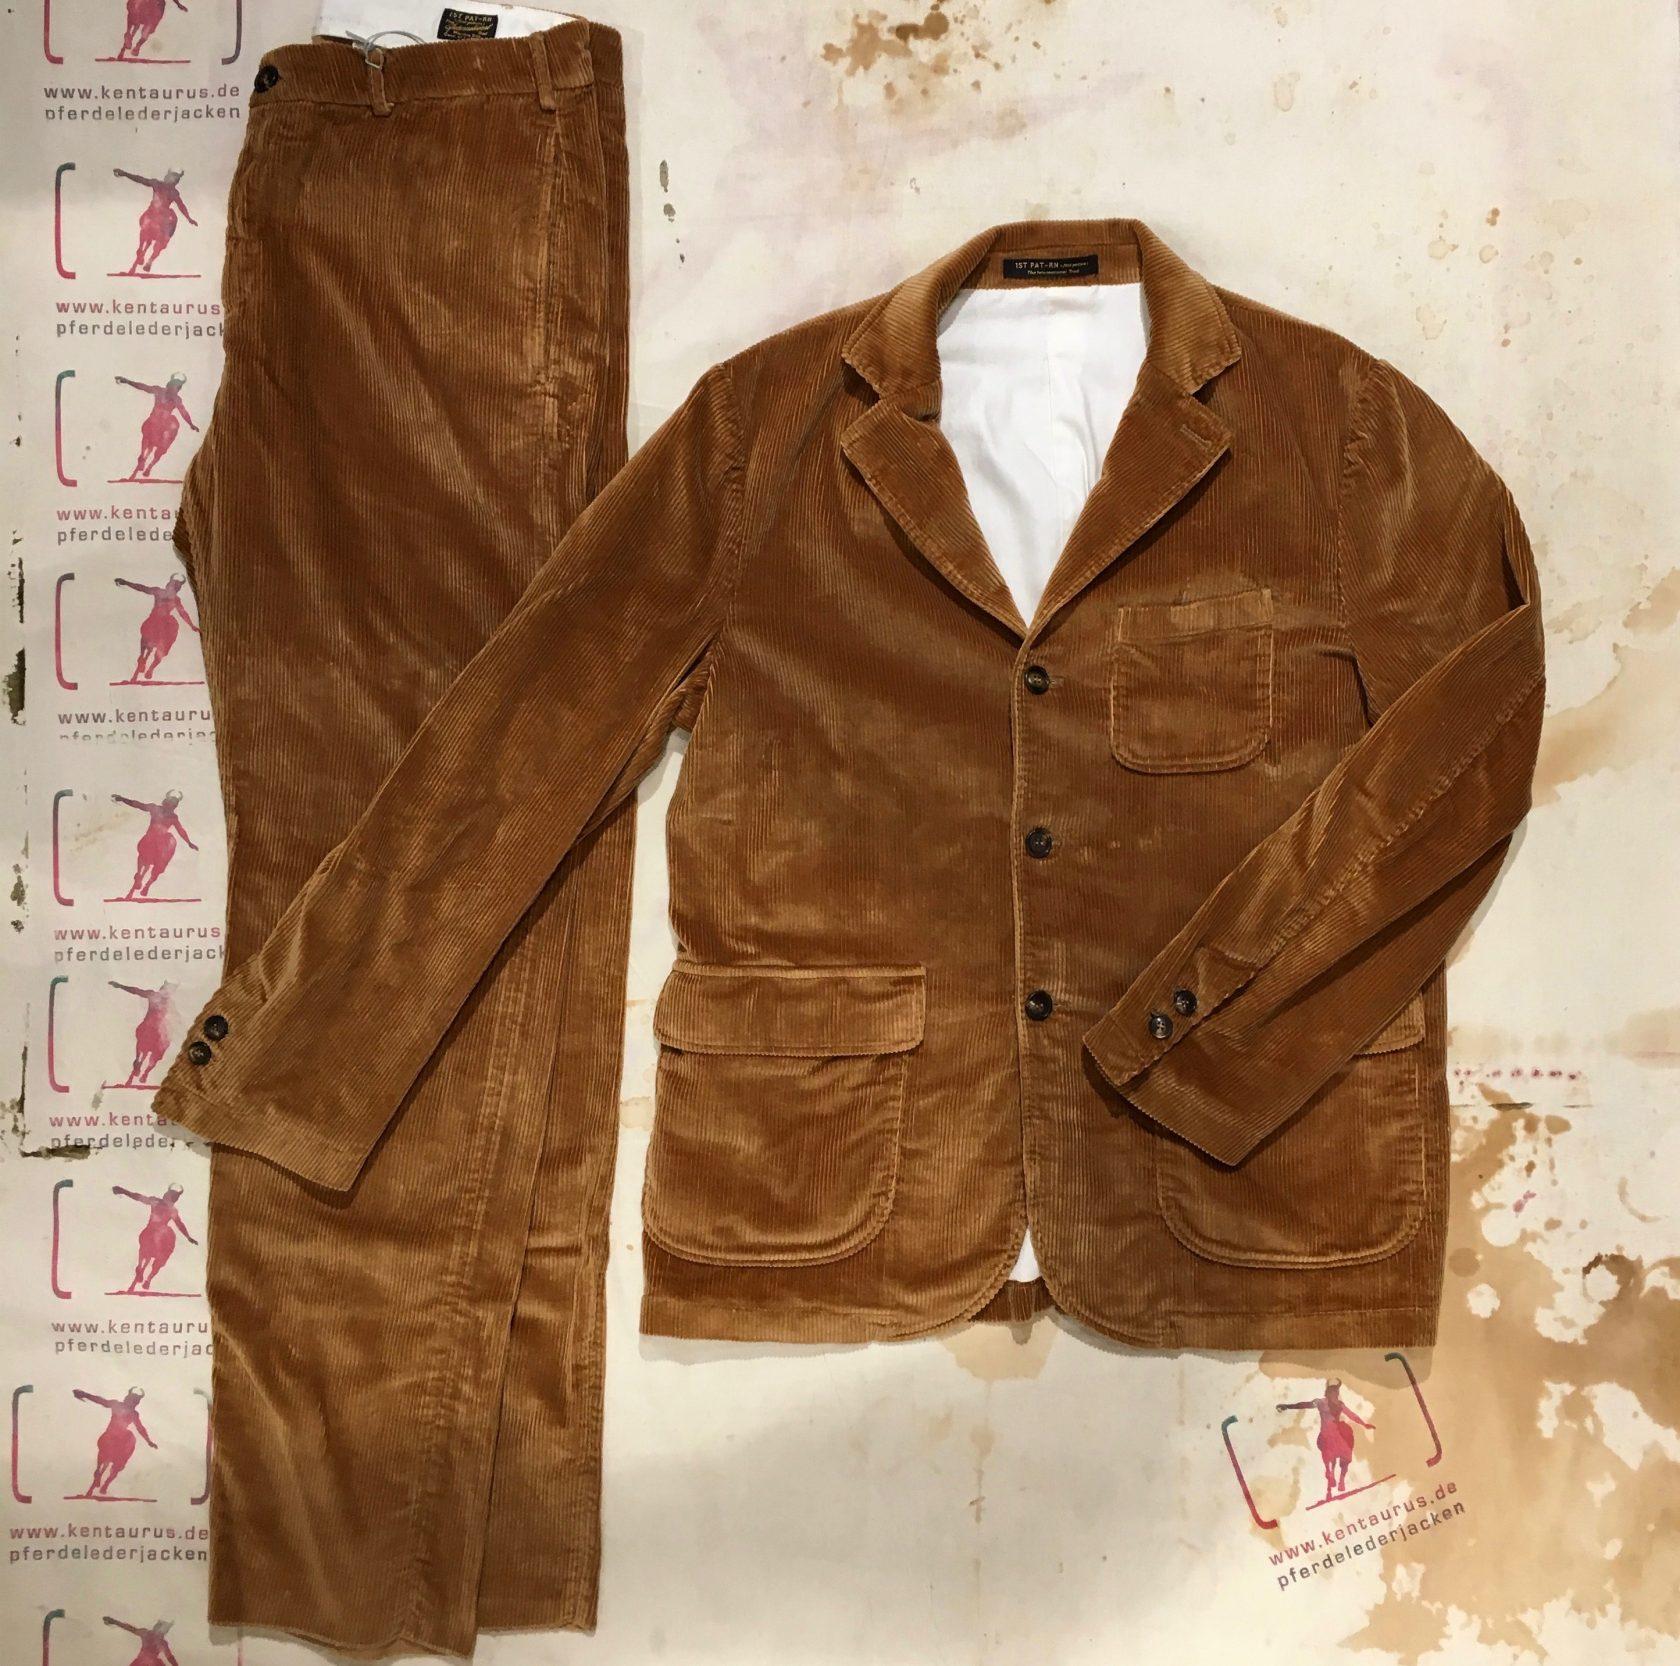 1st-Pat-rn Suit Woody